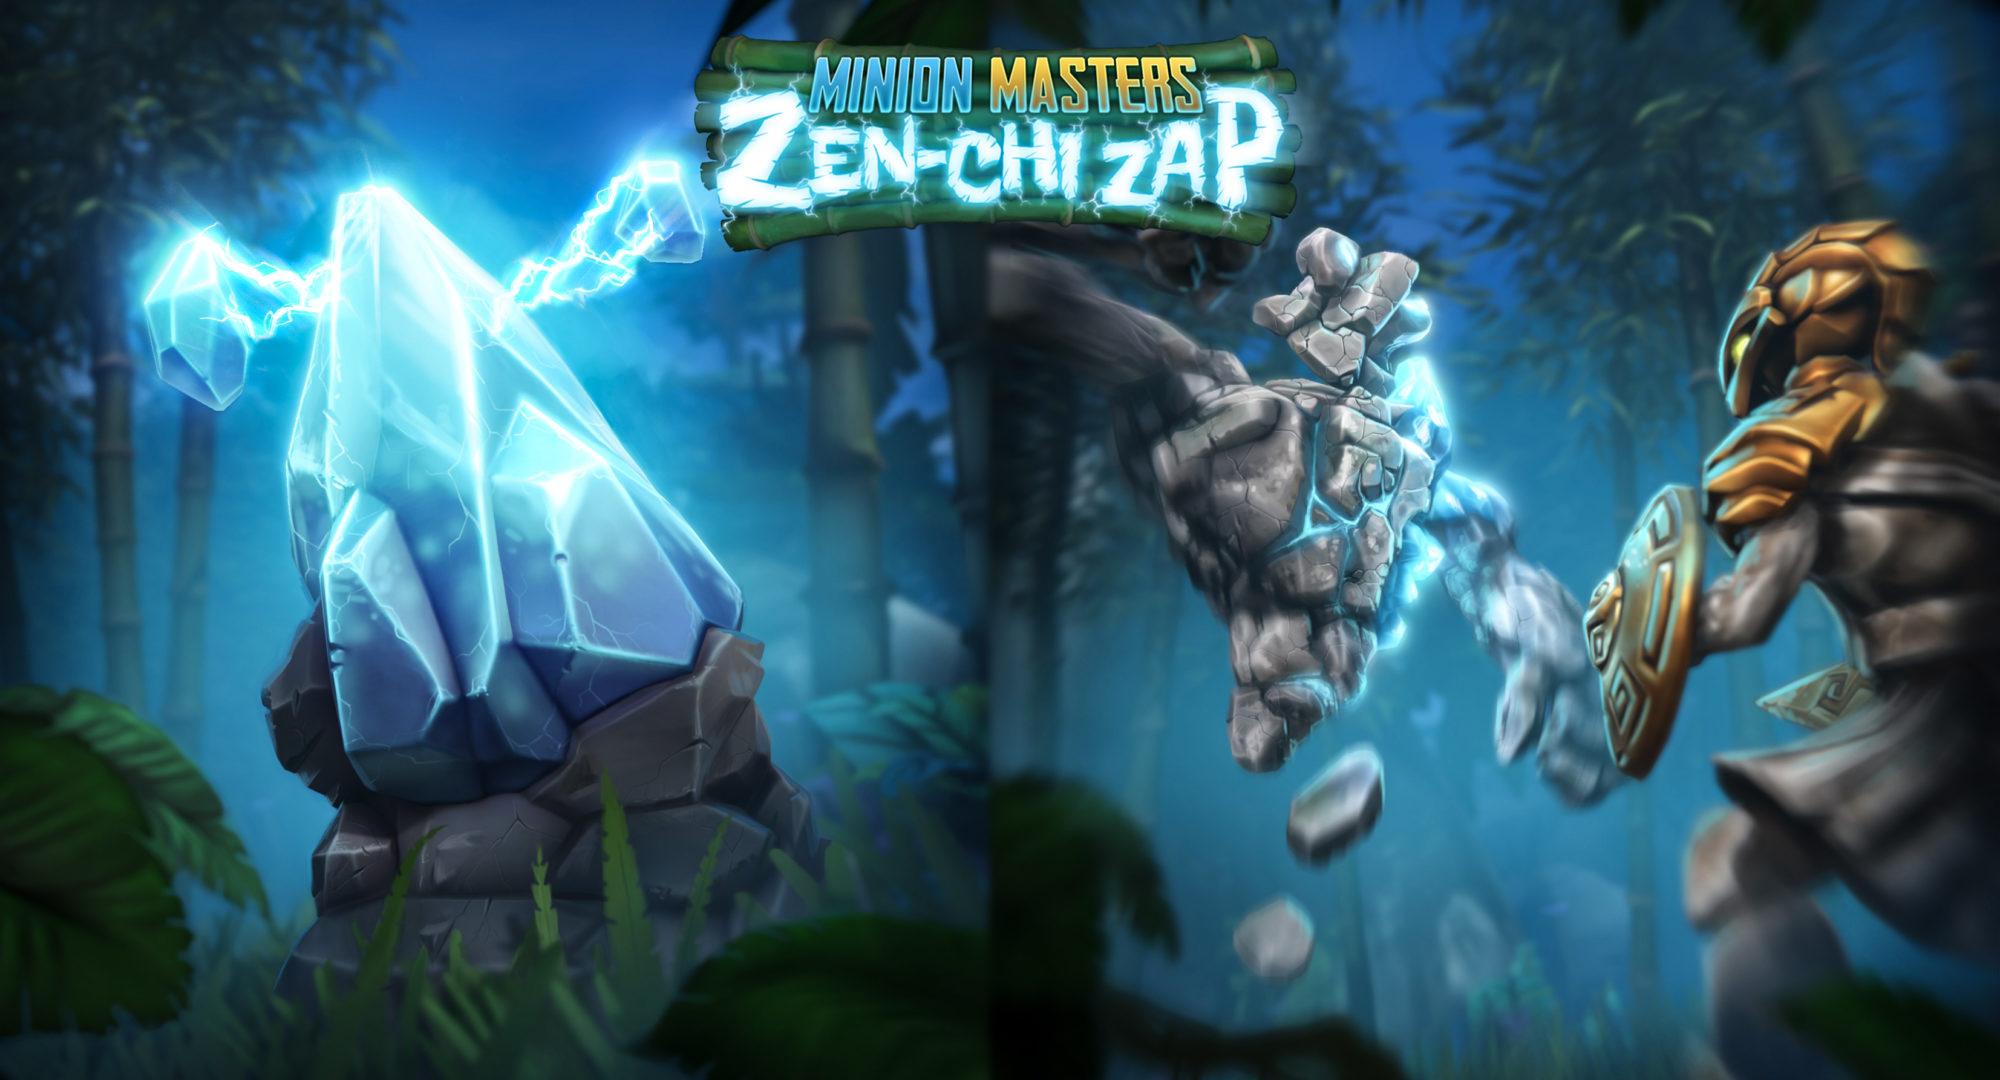 "Minion Masters: Neue Saison ""Zen-Shi Zap"" steht bevor | gaming"